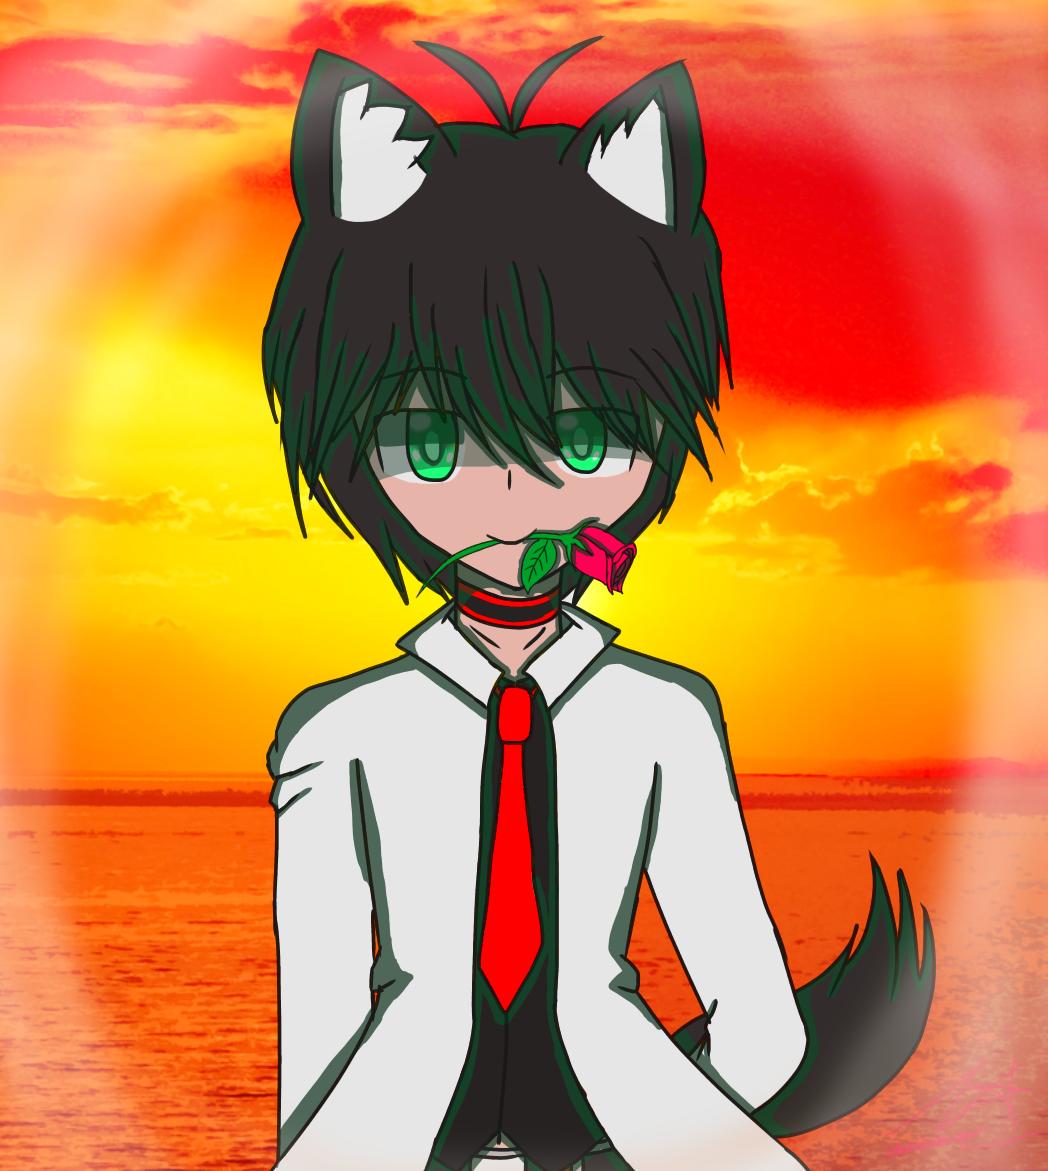 Keito in Valentine's Day